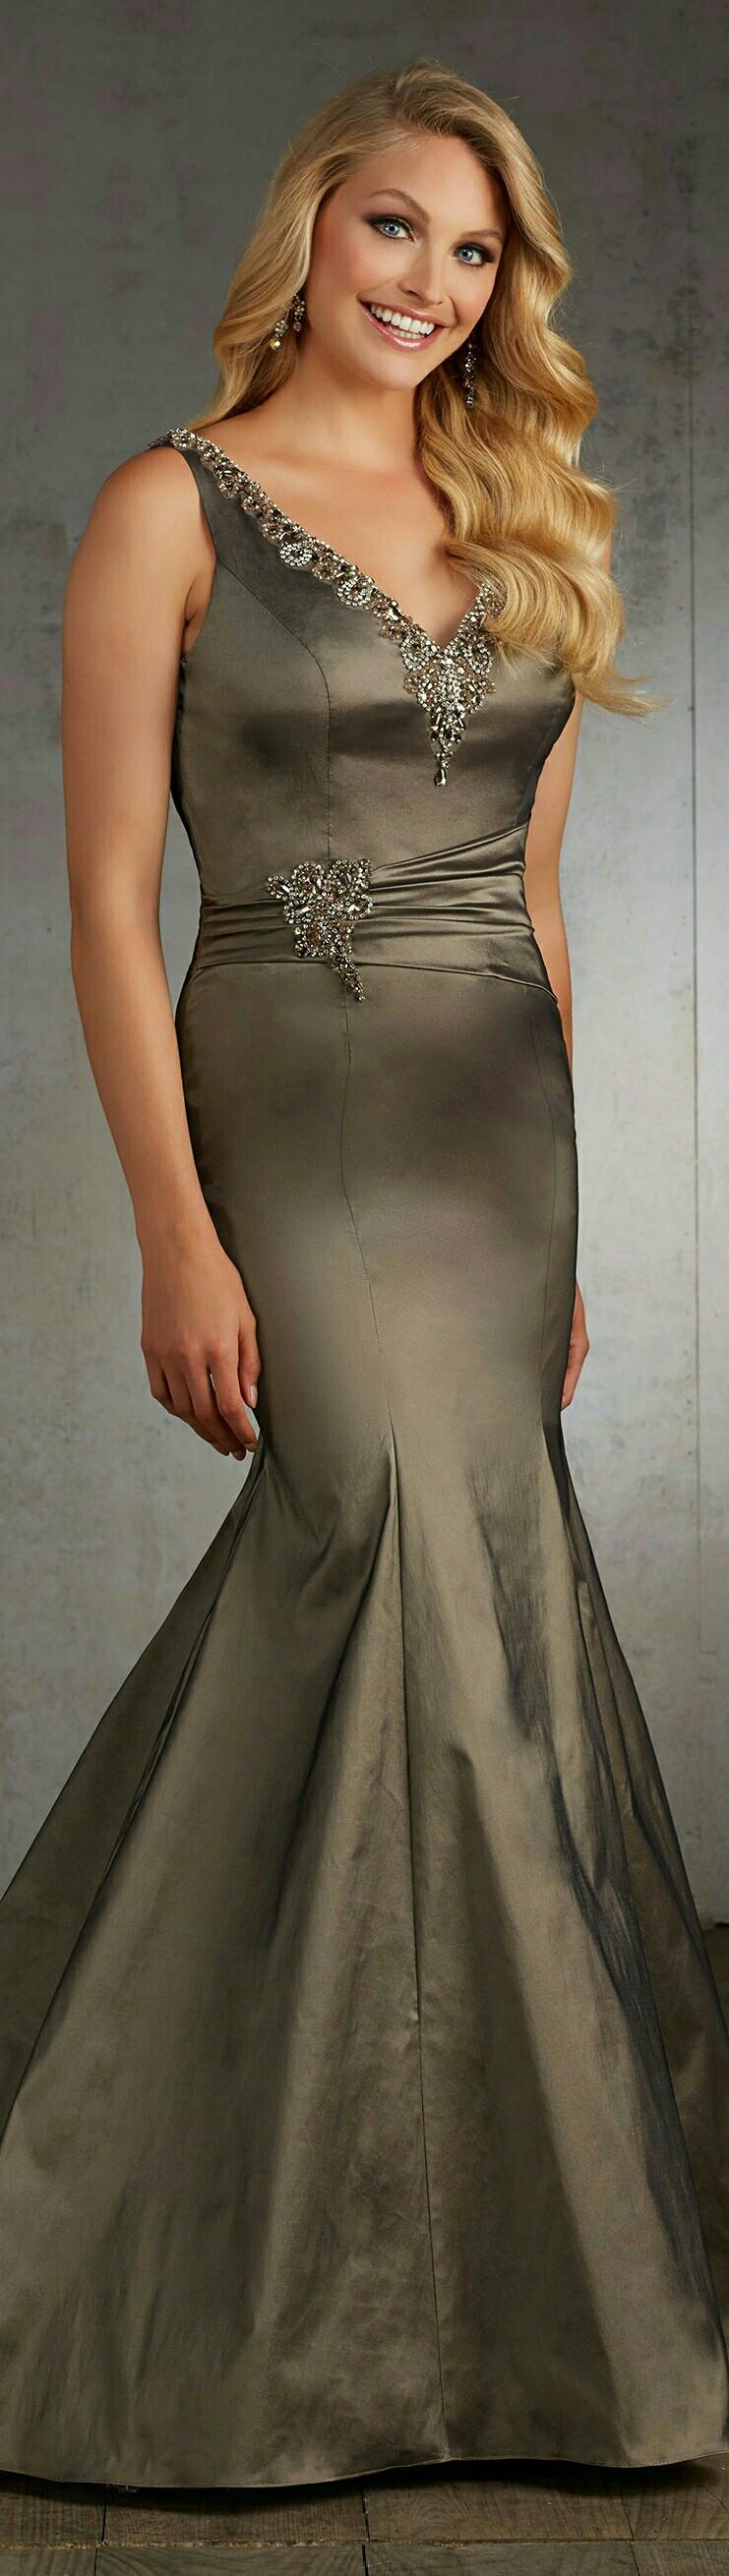 MORI LEE | For Madeleine Gardiner In Bronze Mermaid-Style | #71532 ...